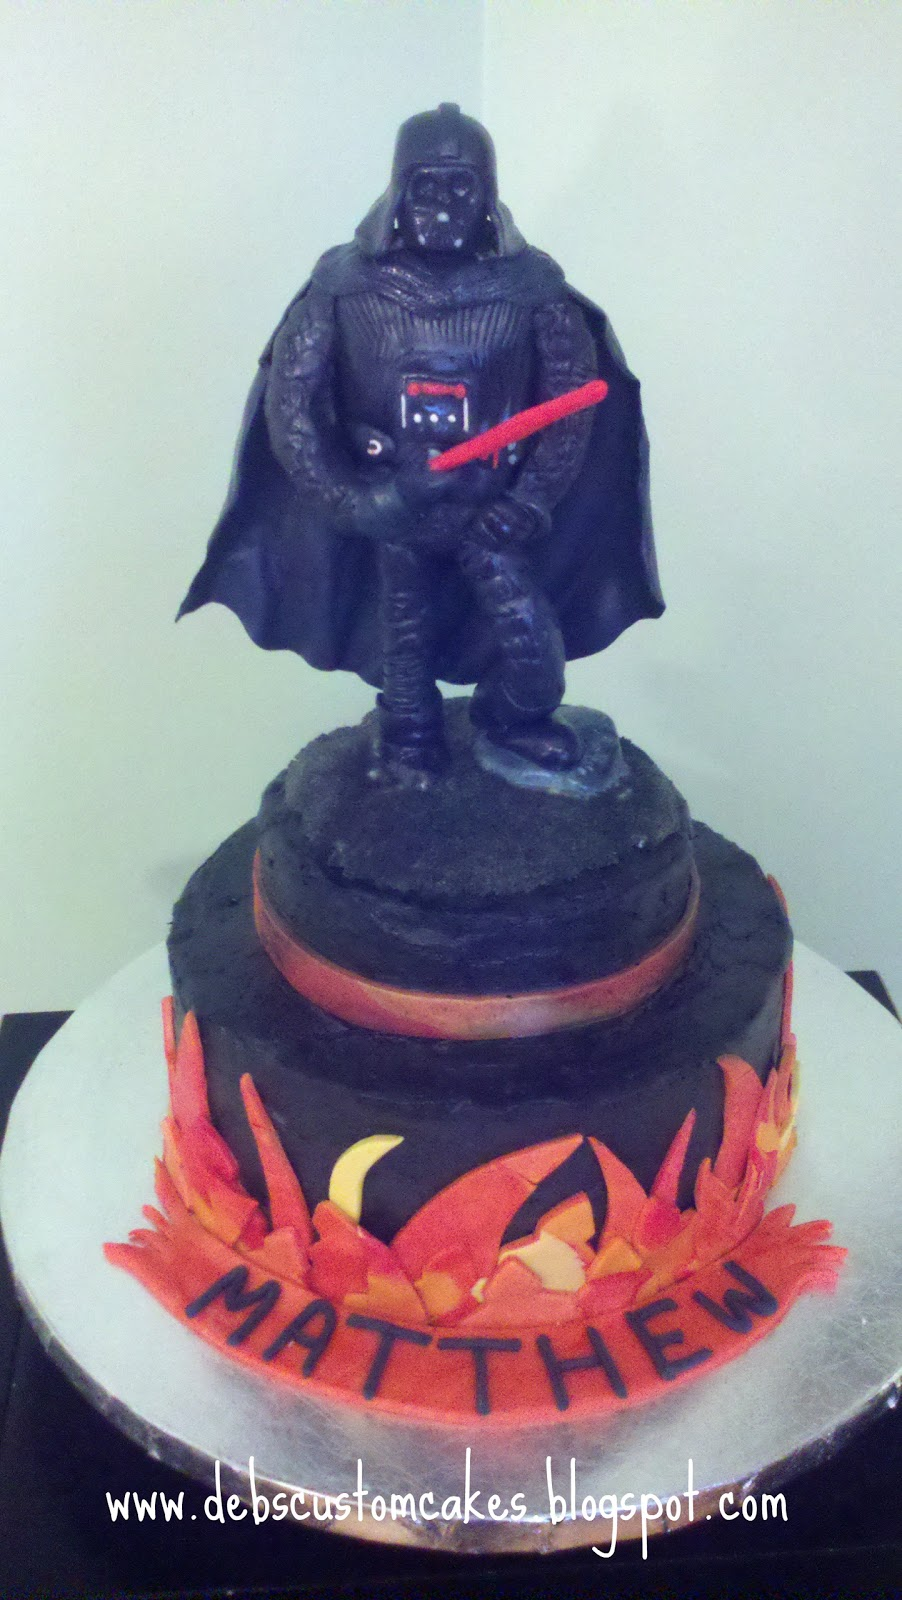 Debs Custom Cakes Darth Vader Cake